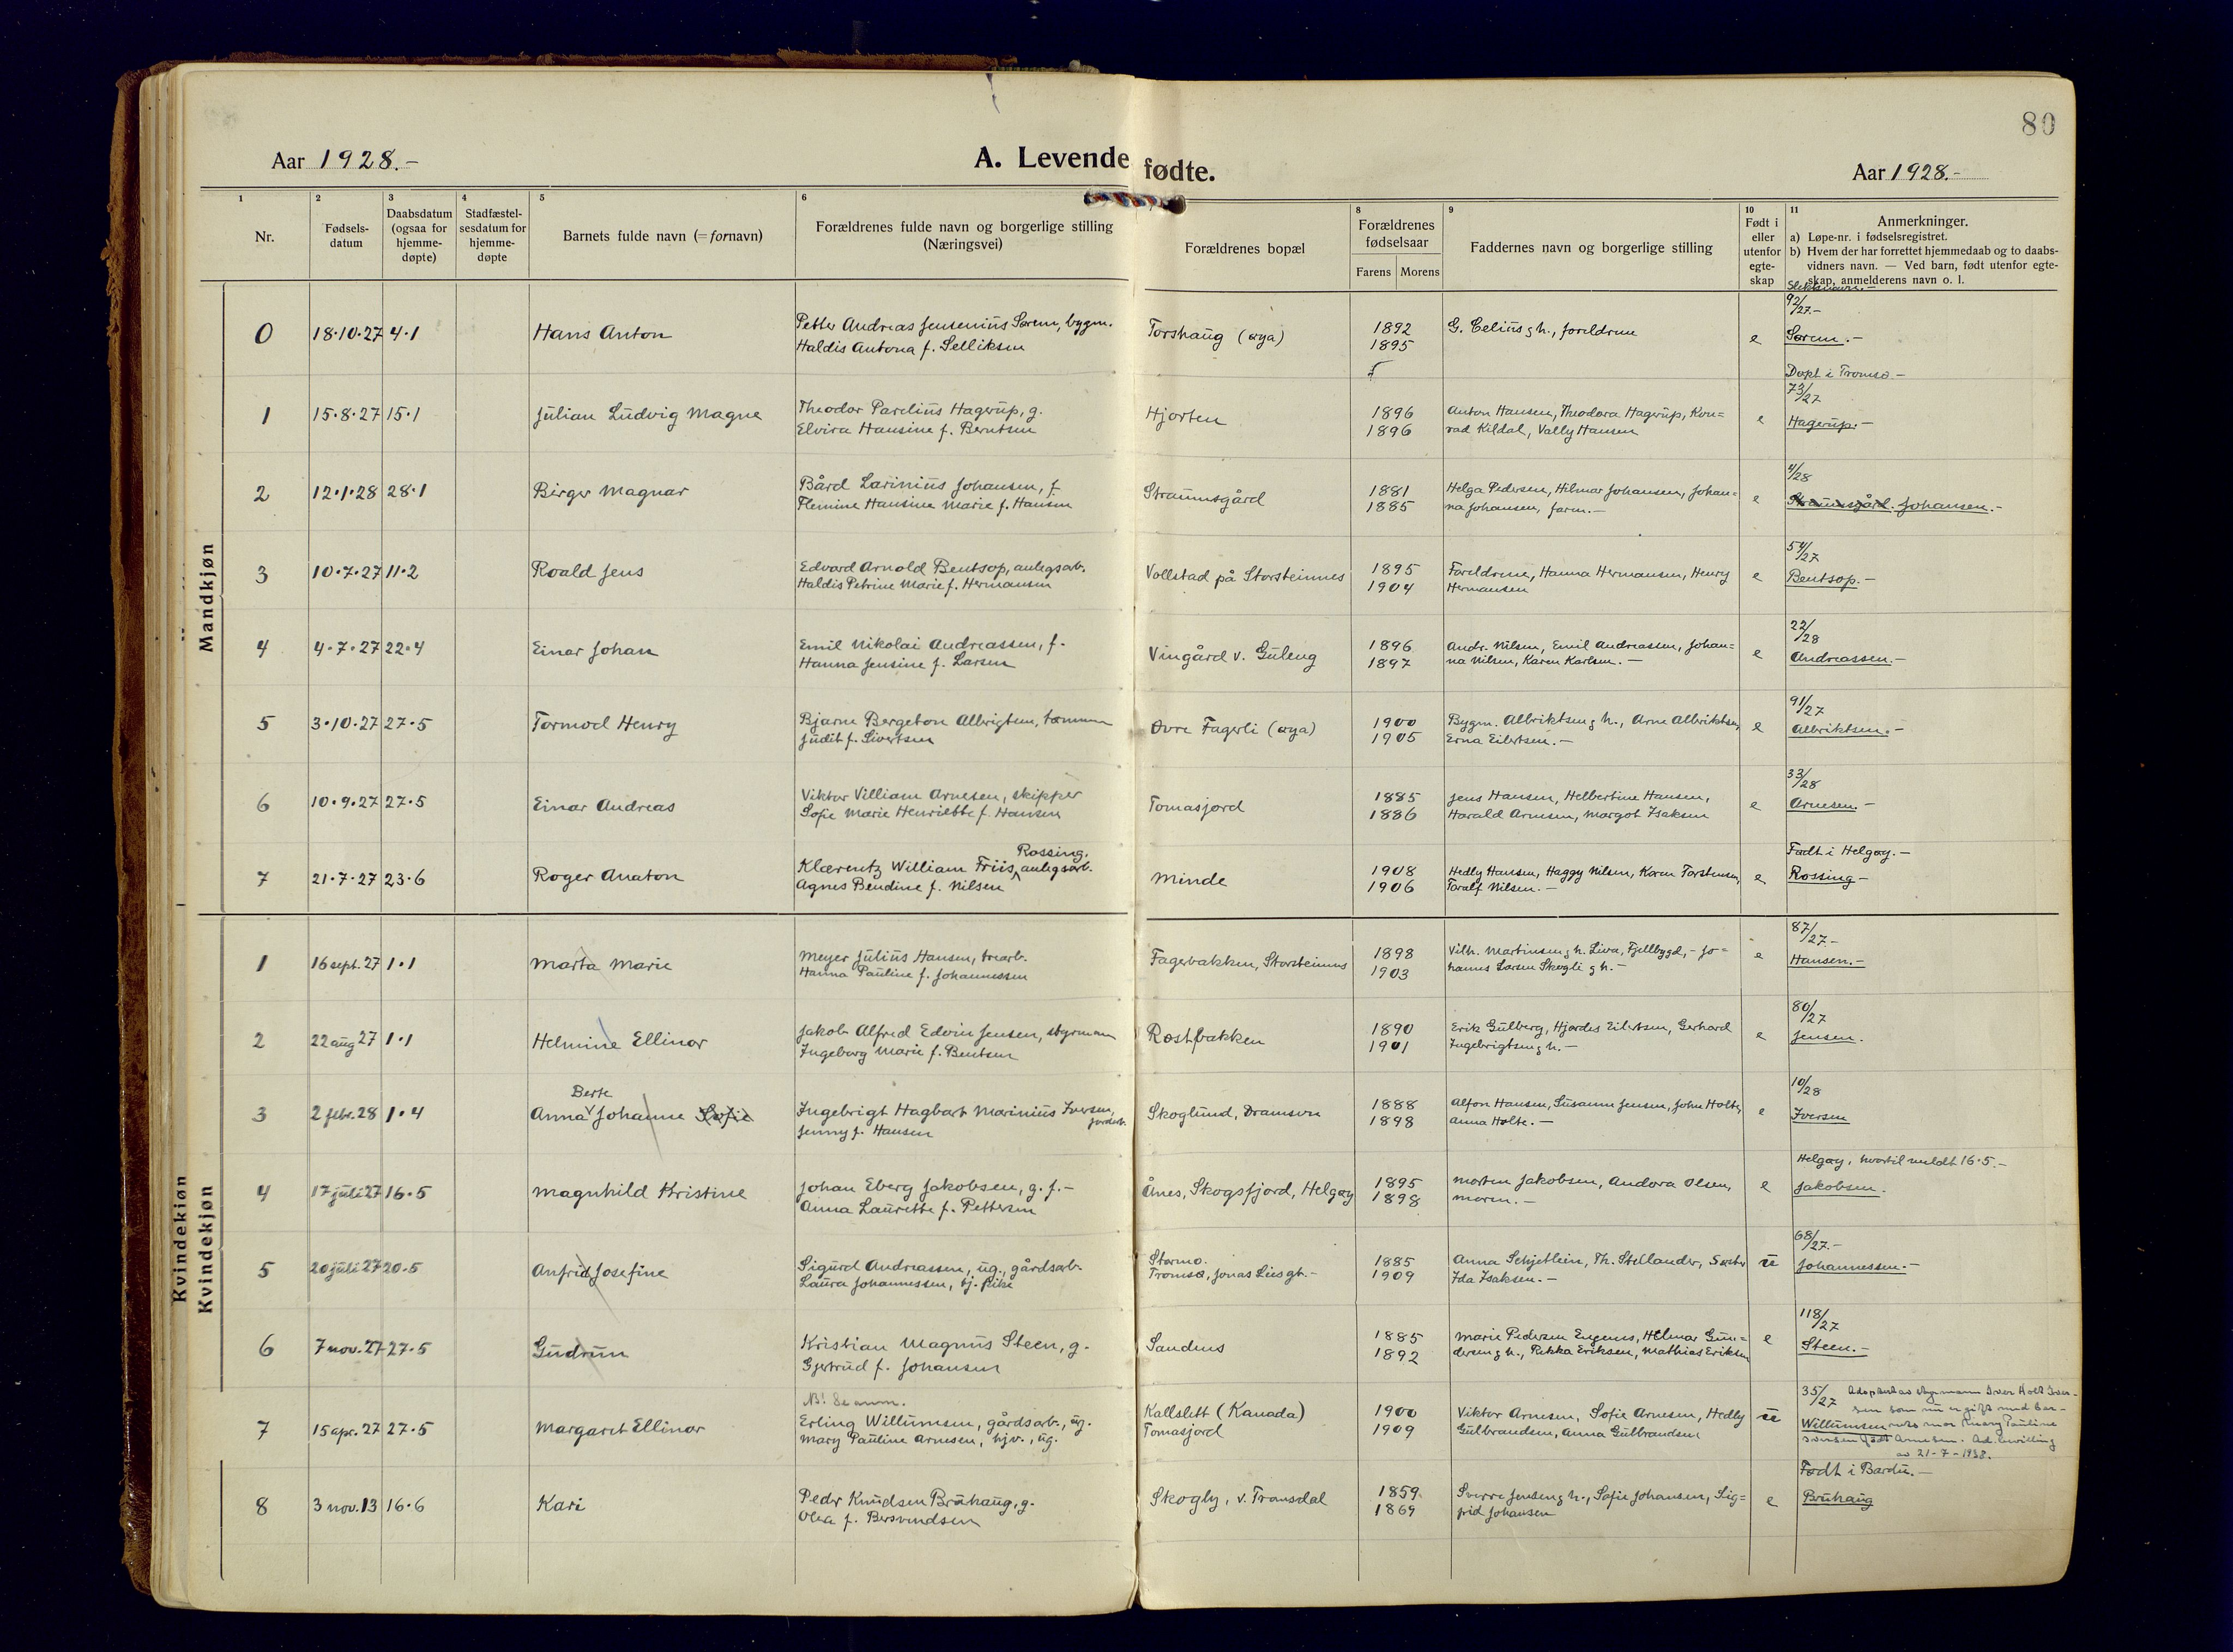 SATØ, Tromsøysund sokneprestkontor, G/Ga: Ministerialbok nr. 9, 1922-1934, s. 80